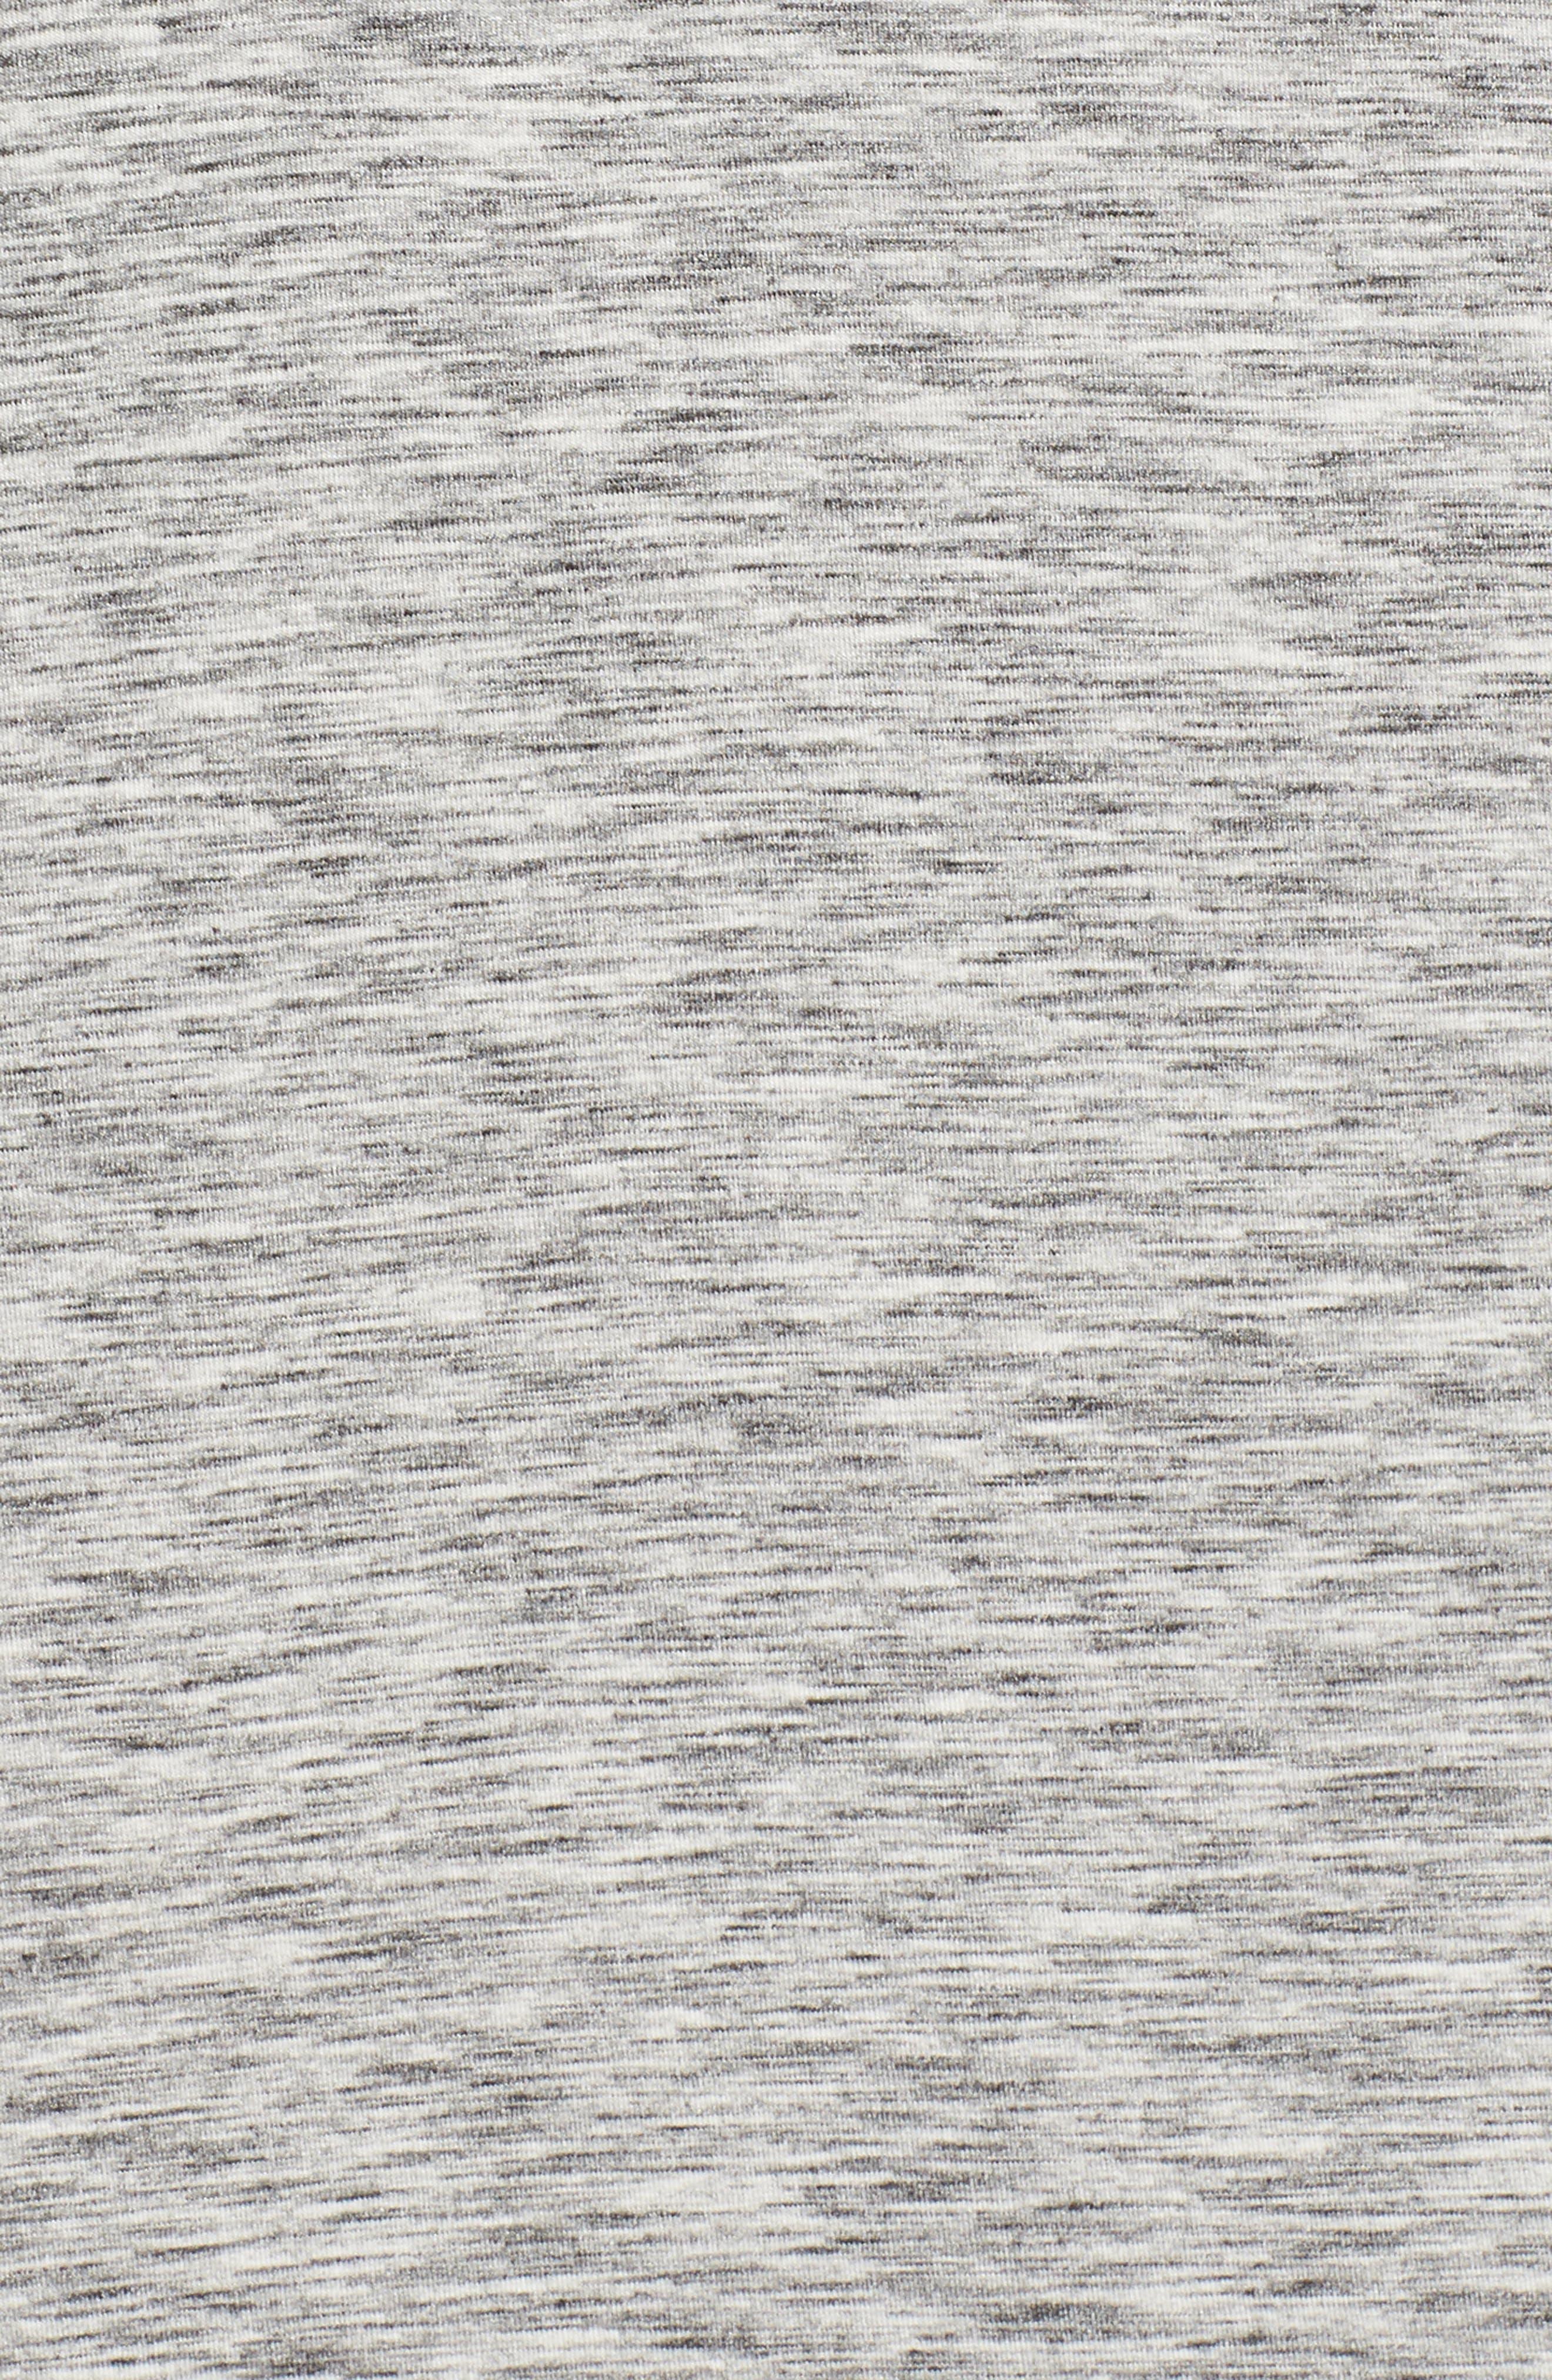 Dolman Sleeve Nightshirt,                             Alternate thumbnail 27, color,